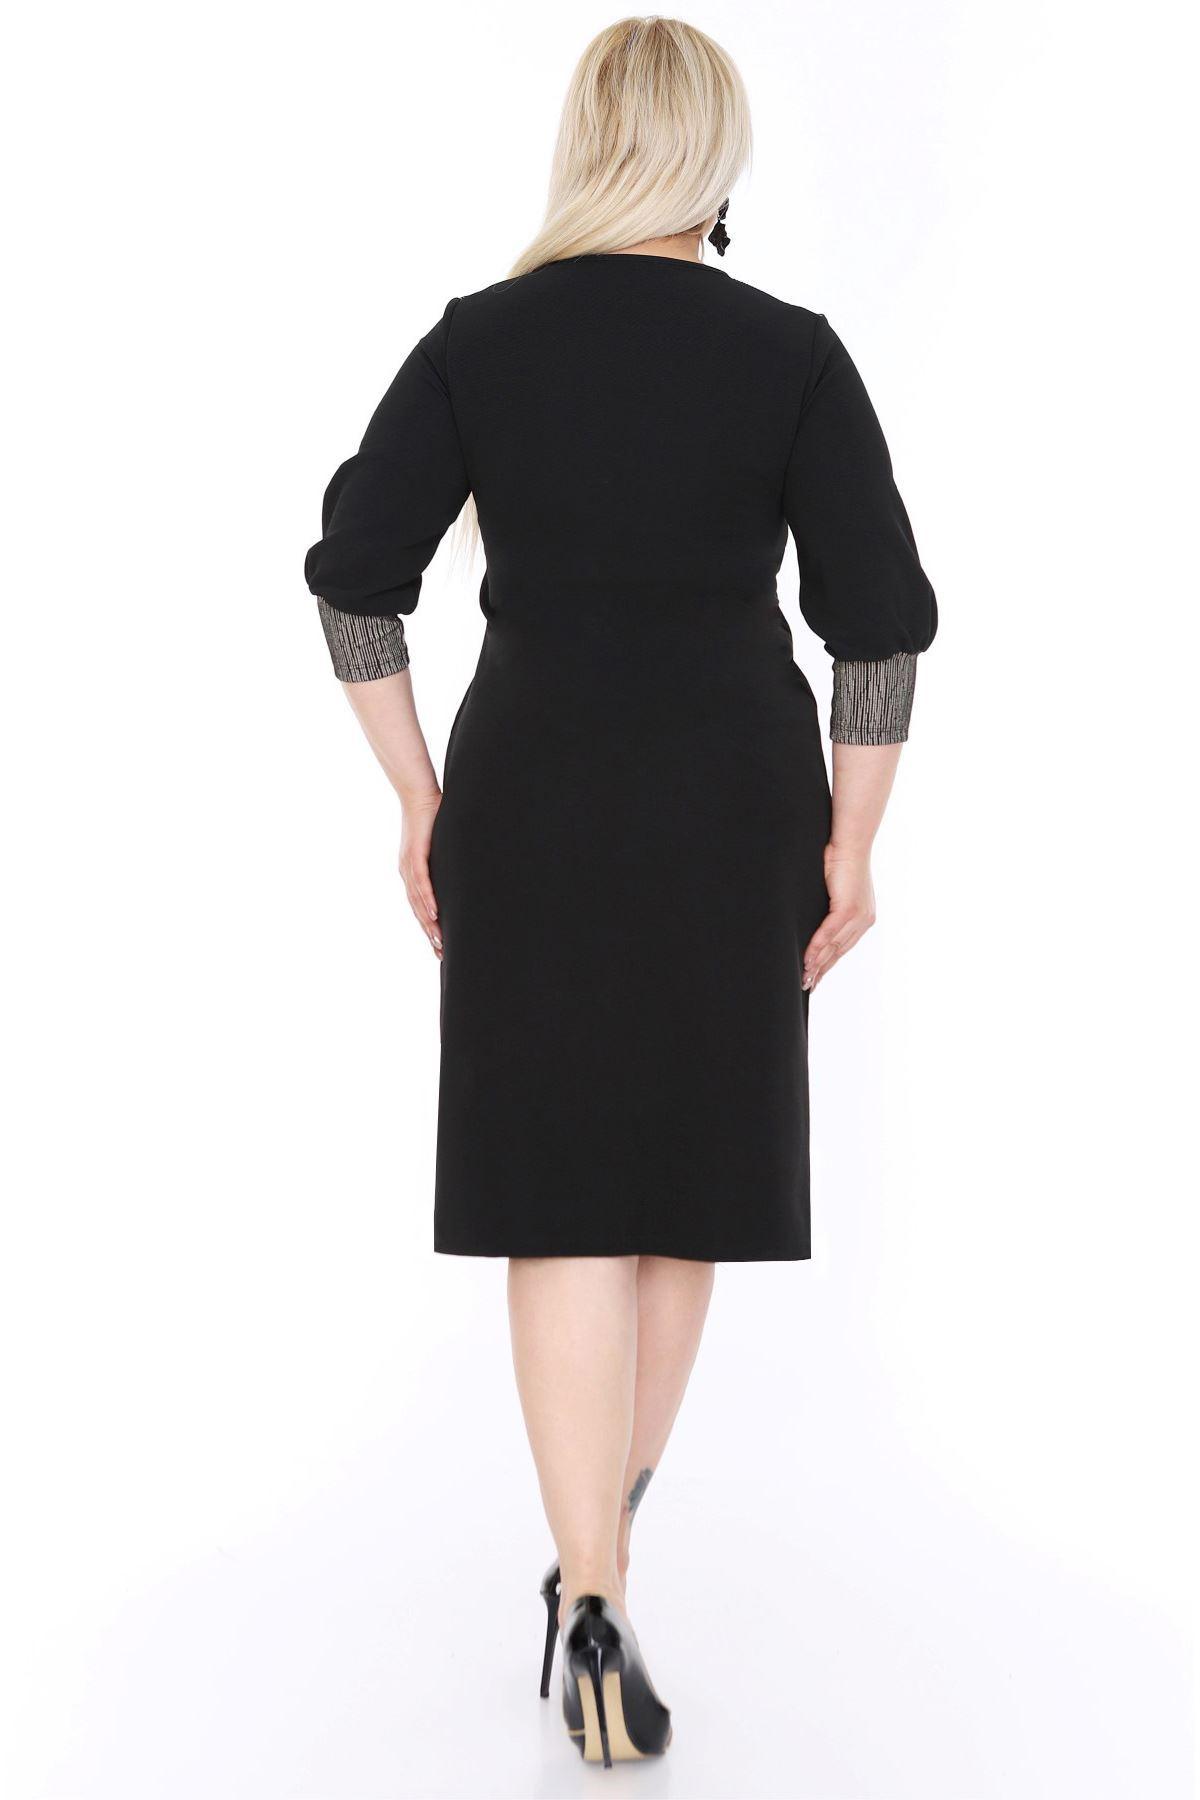 Manşet Kollu Elbise 20L-0448